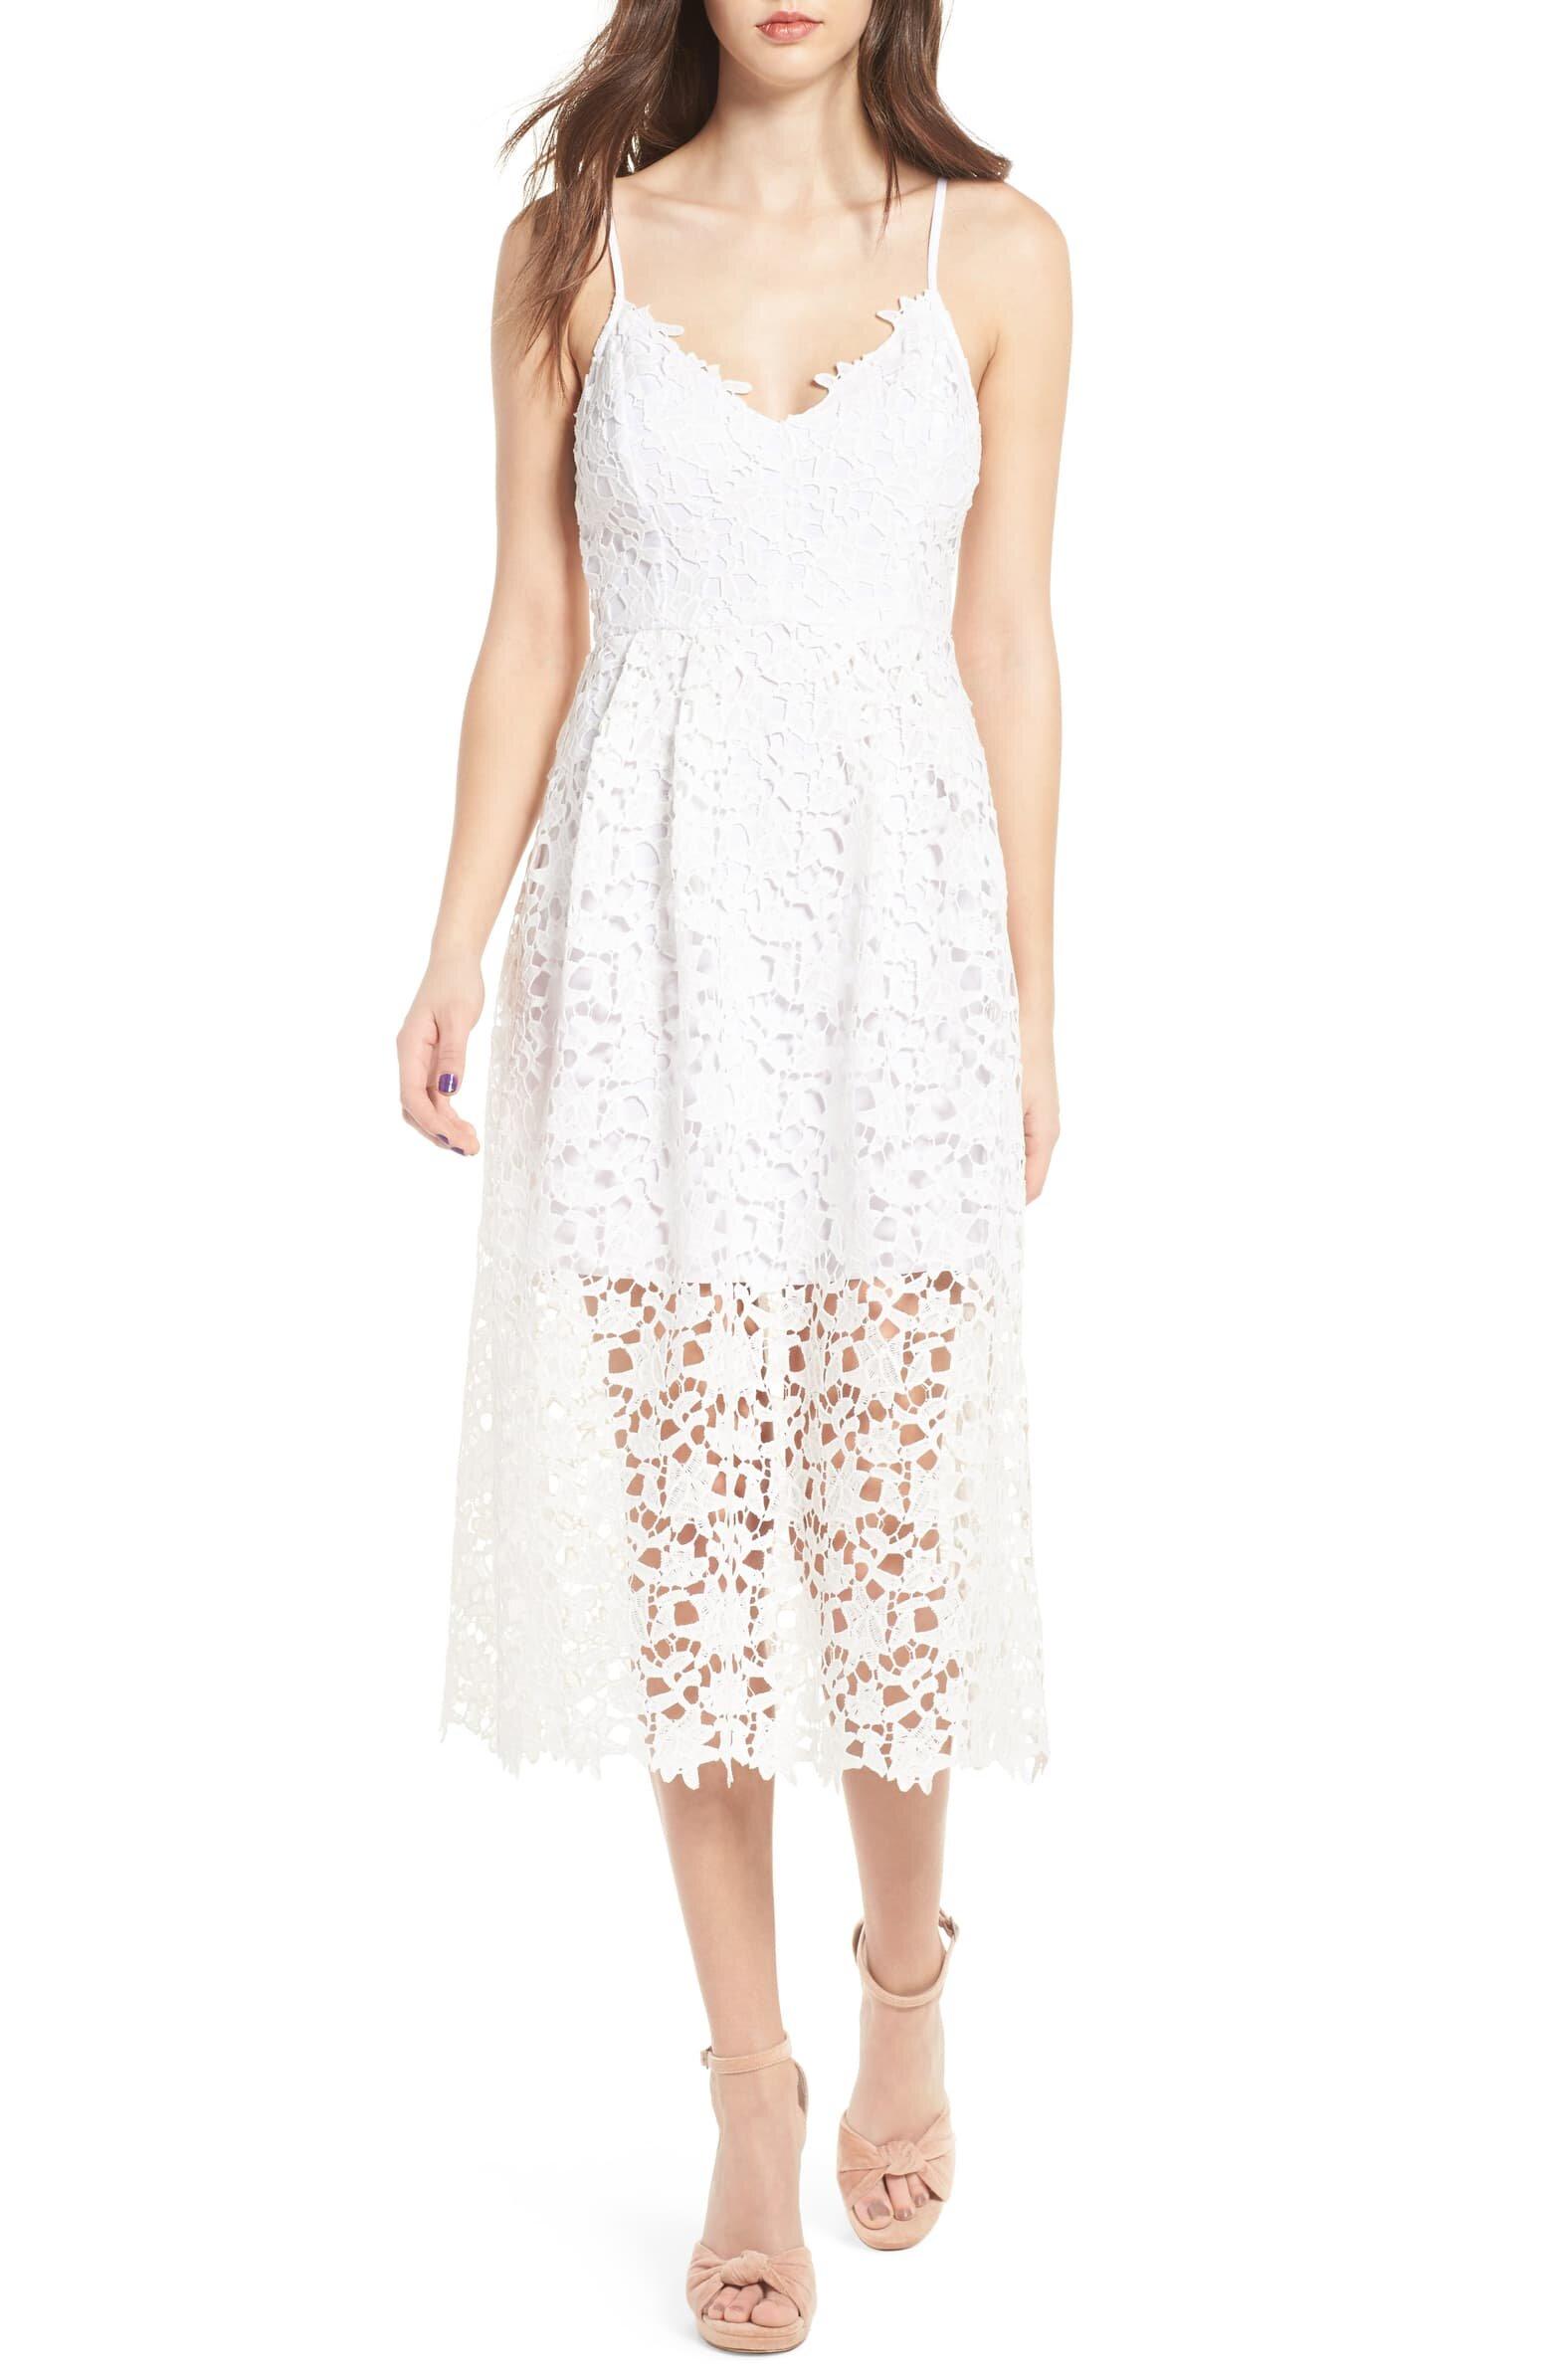 WESTWOOD WHITE HALF SLEEVE SHEATH DRESS.jpeg